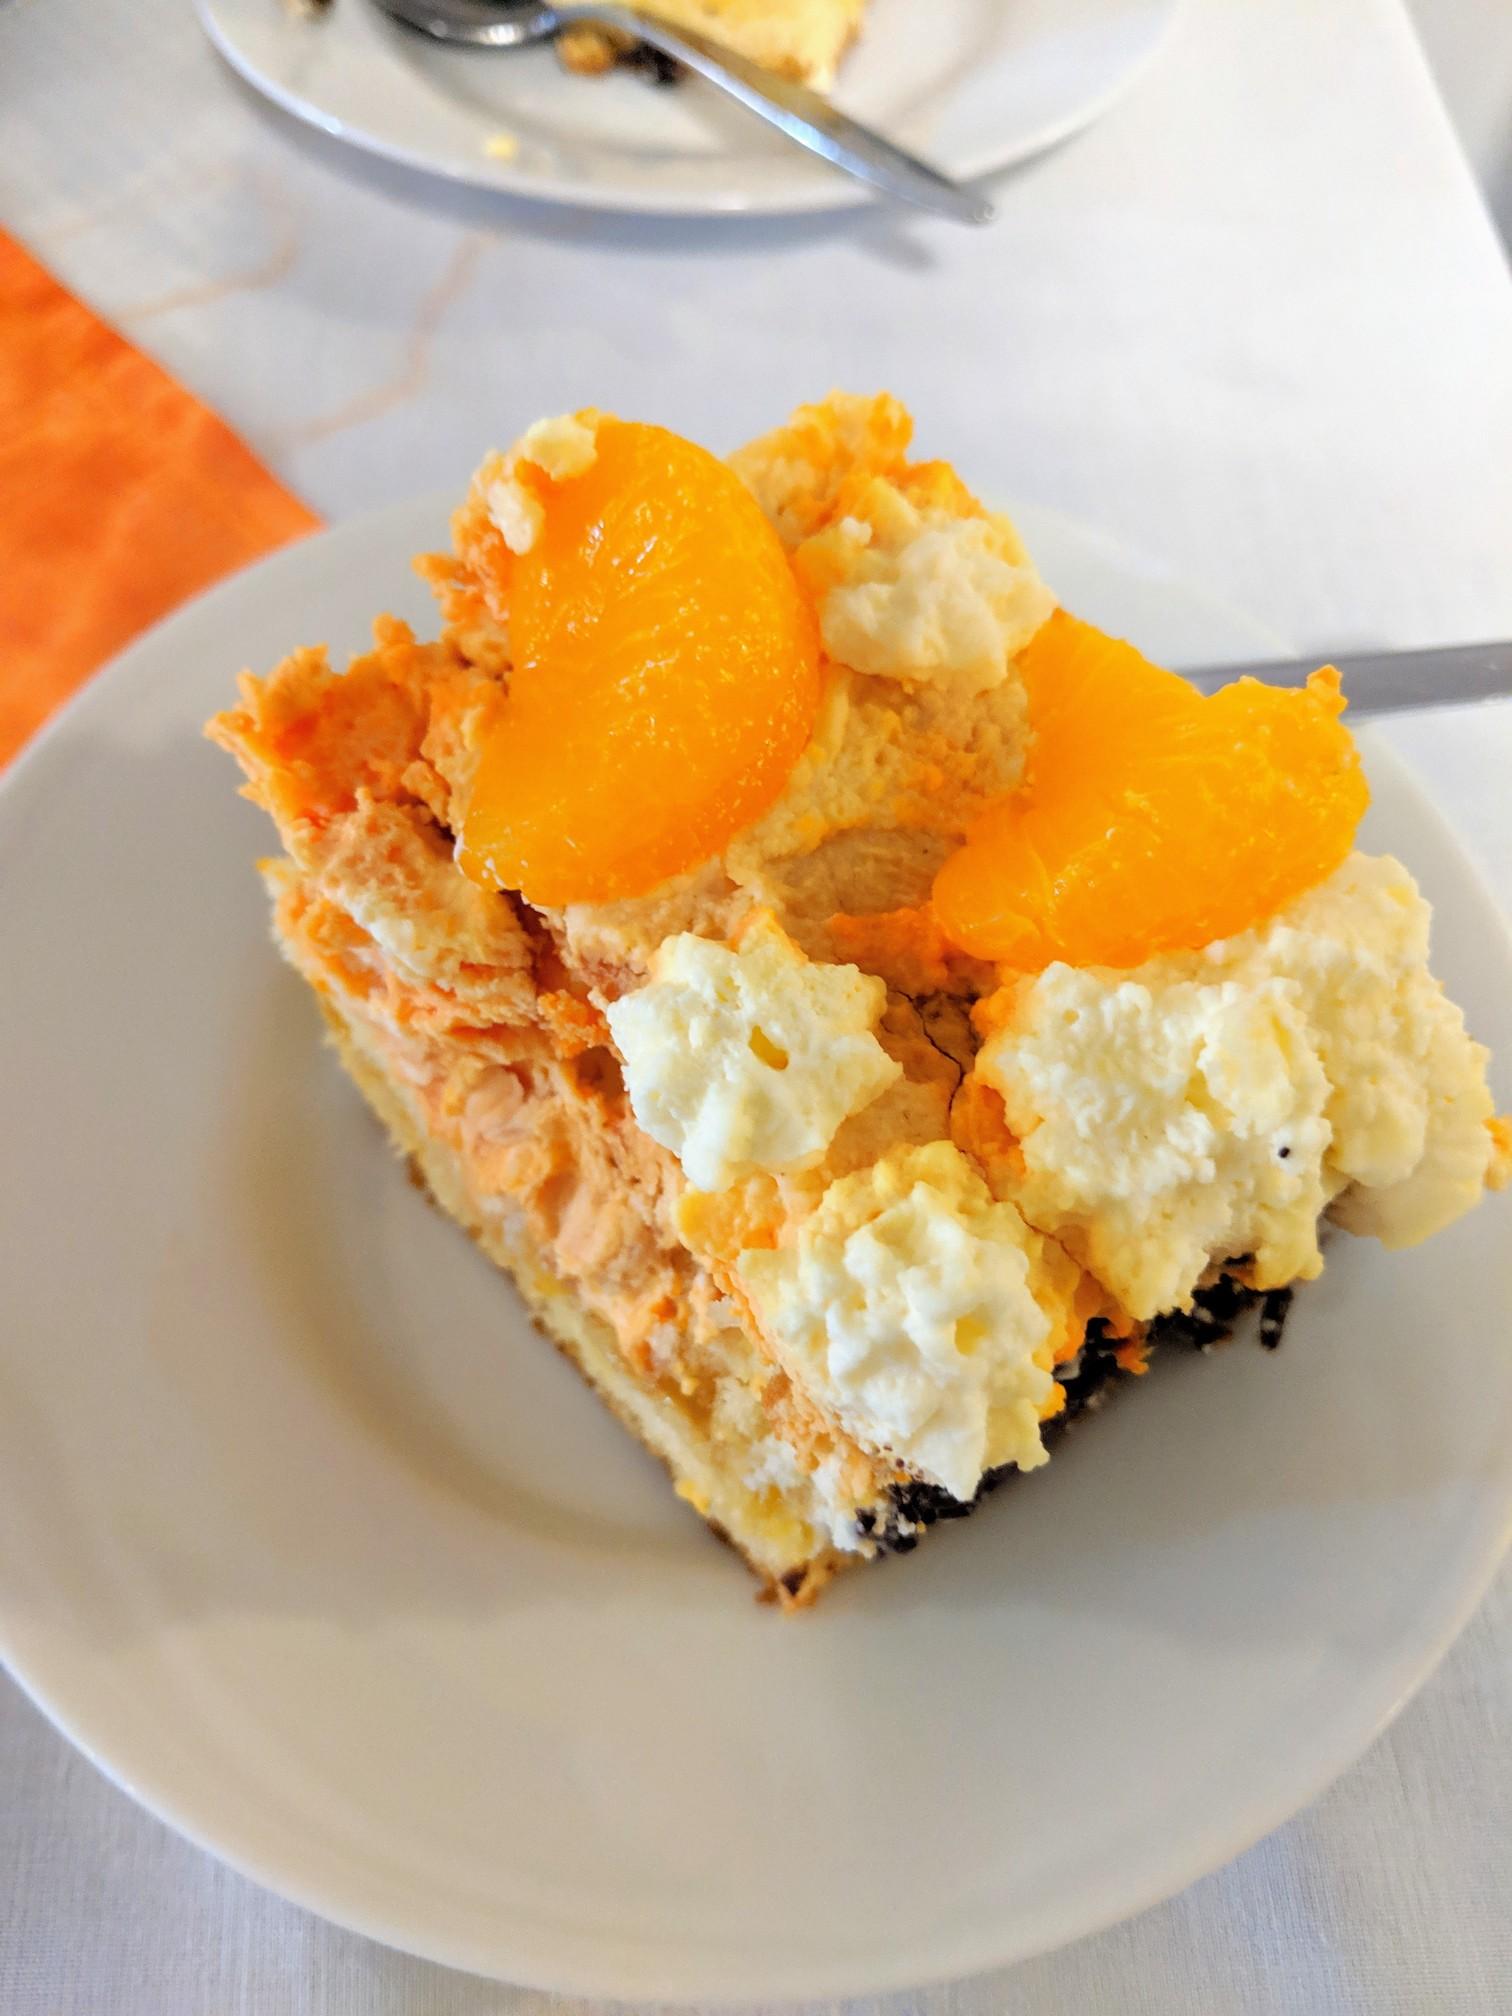 Oranje cake 02.jpg